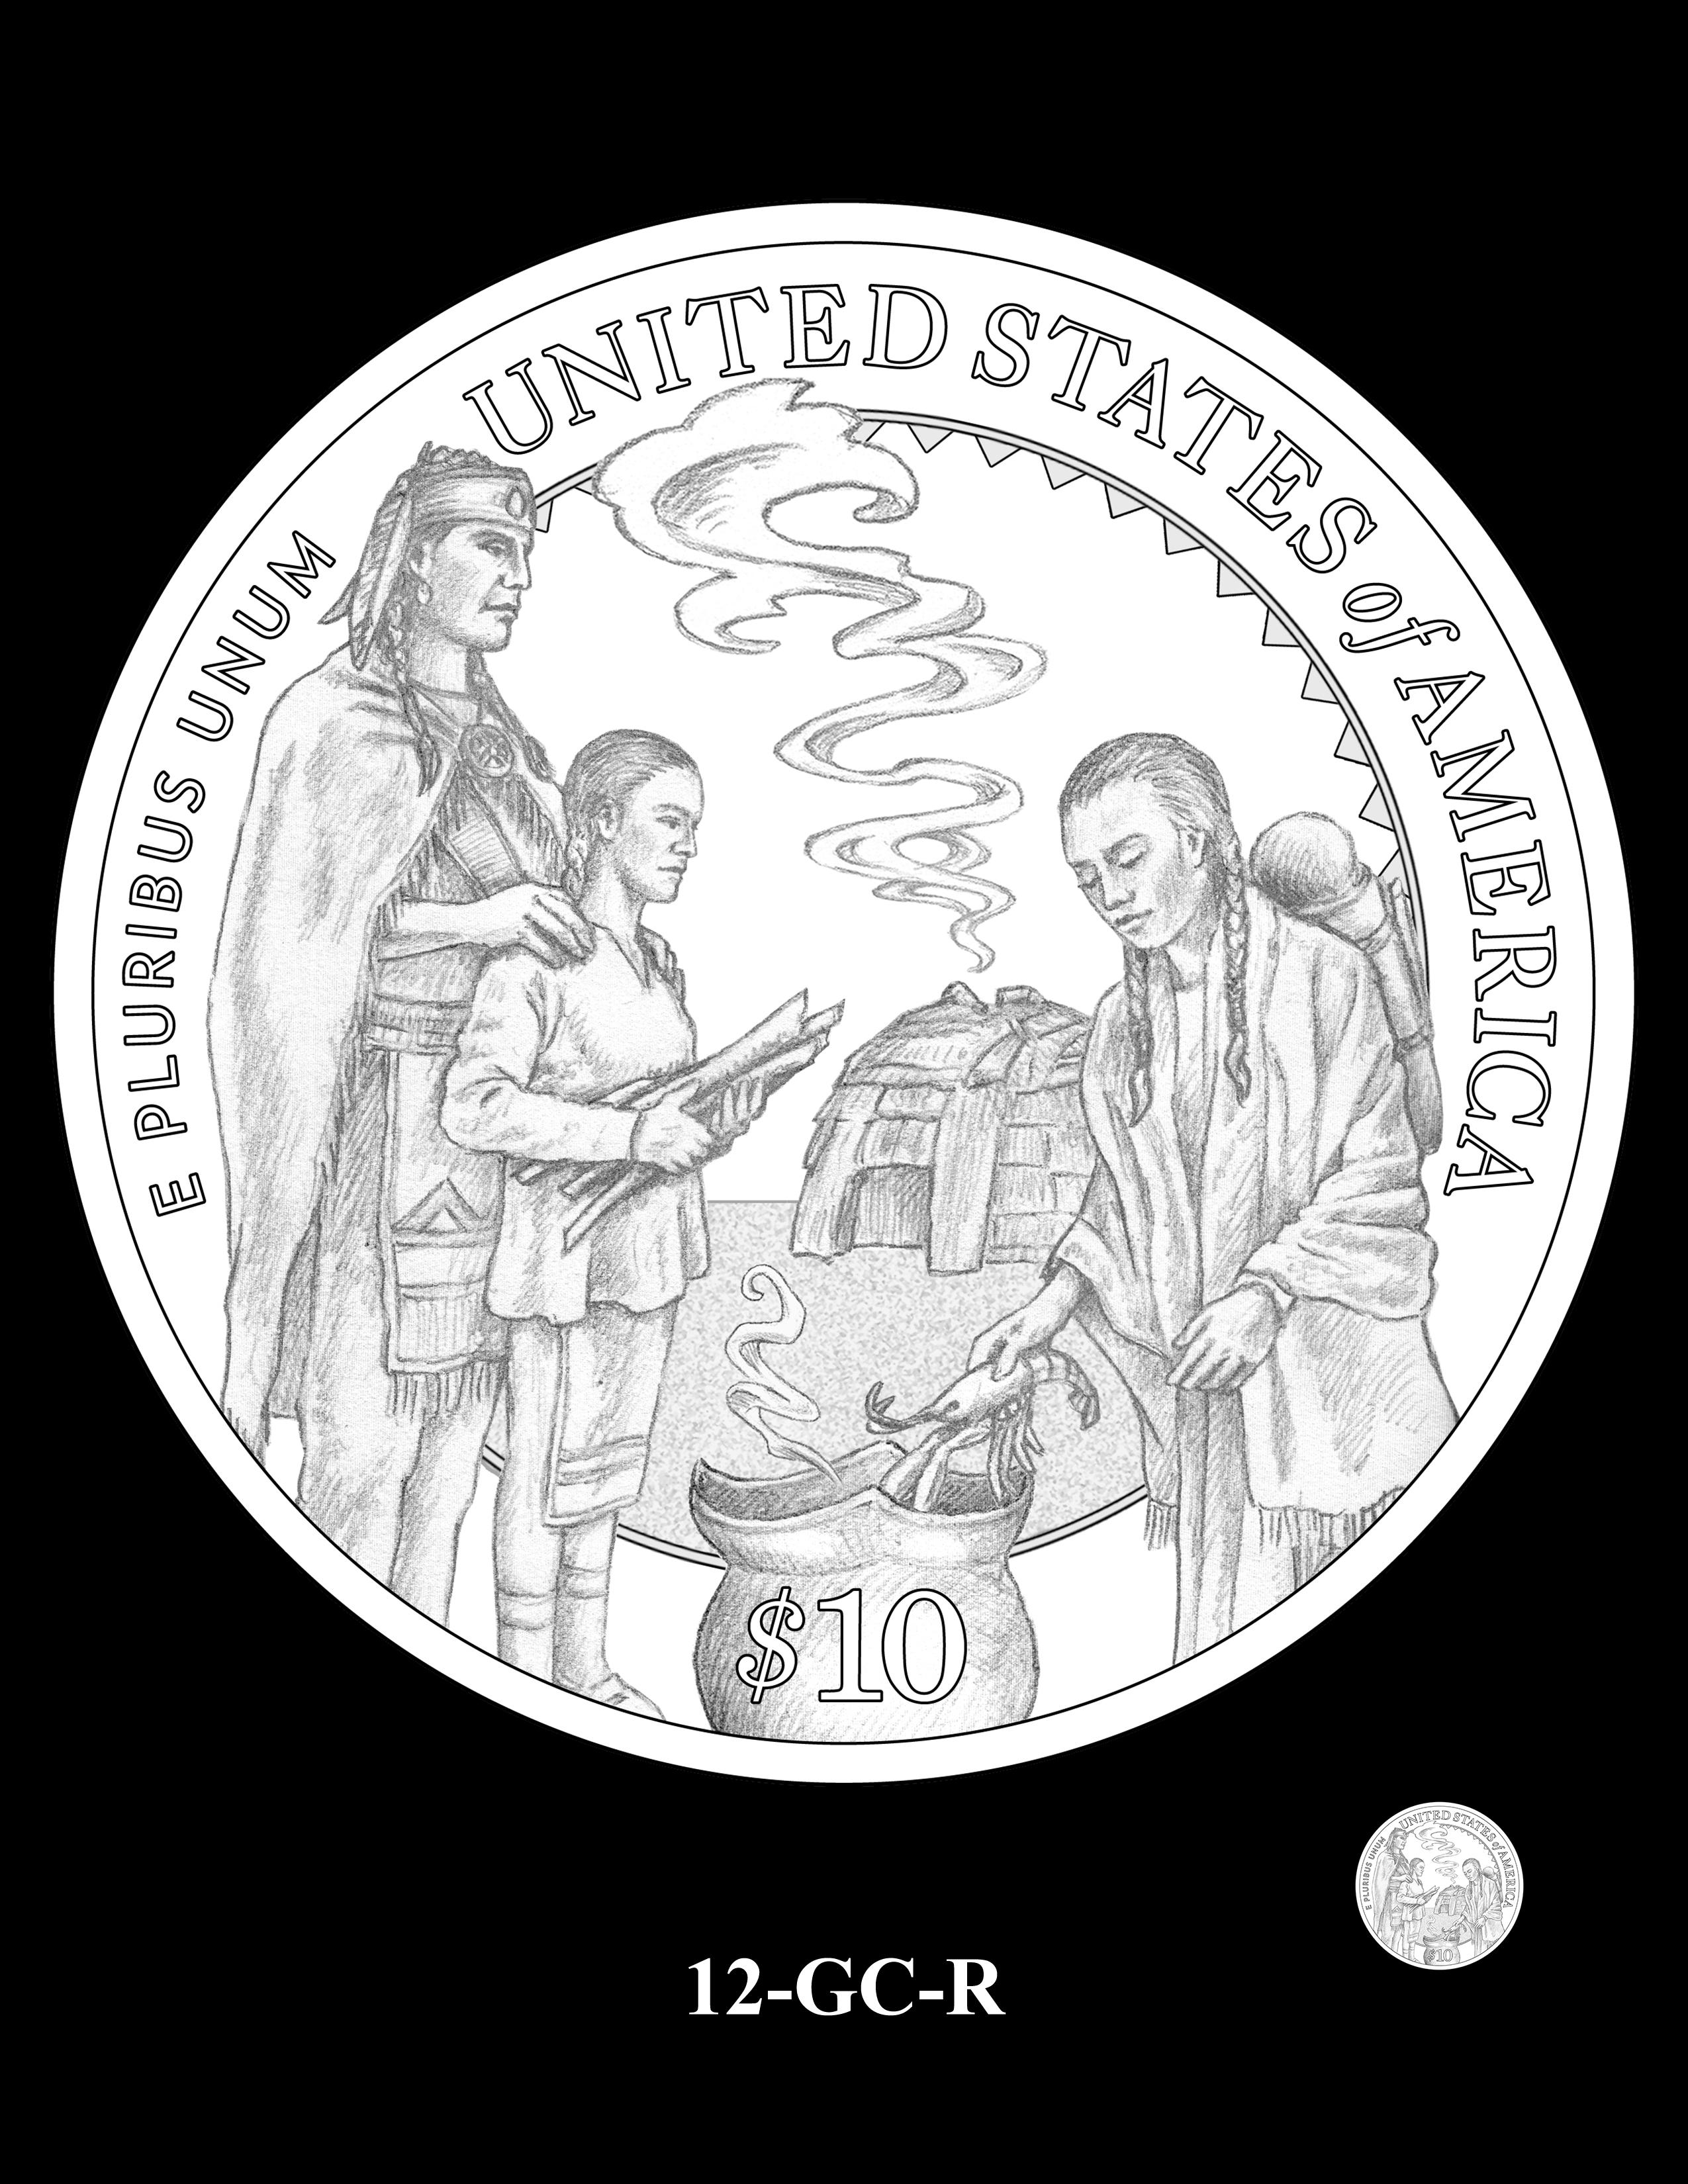 12-GC-R - 2020 Mayflower 400th Anniversary 24K Gold Coin & Silver Medal Program